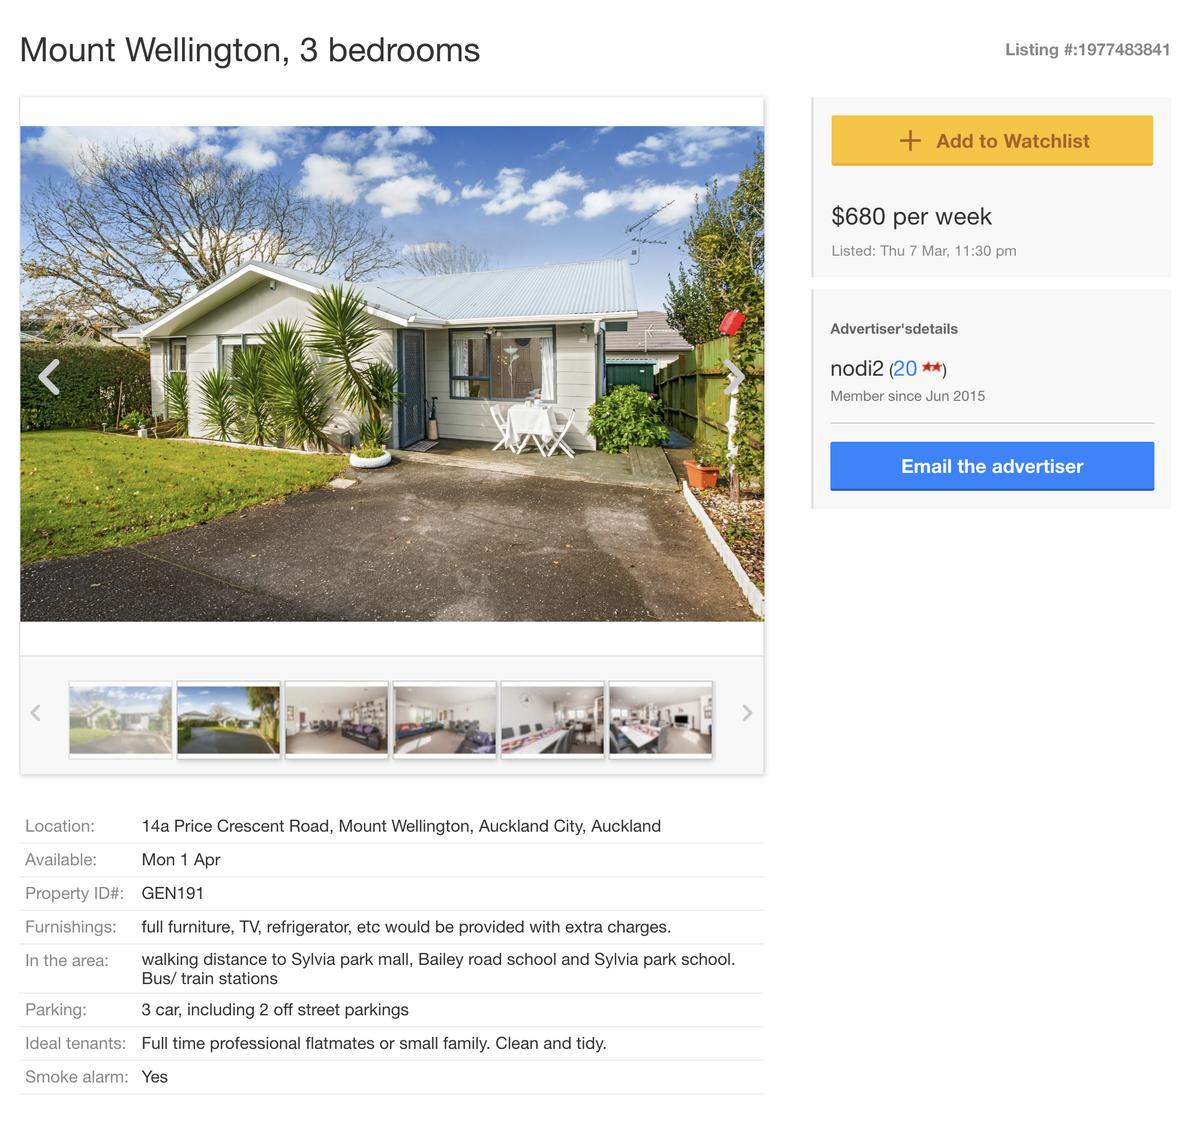 Дом с тремя спальнями в пригороде за 680$ (30 124<span class=ruble>Р</span>) в неделю